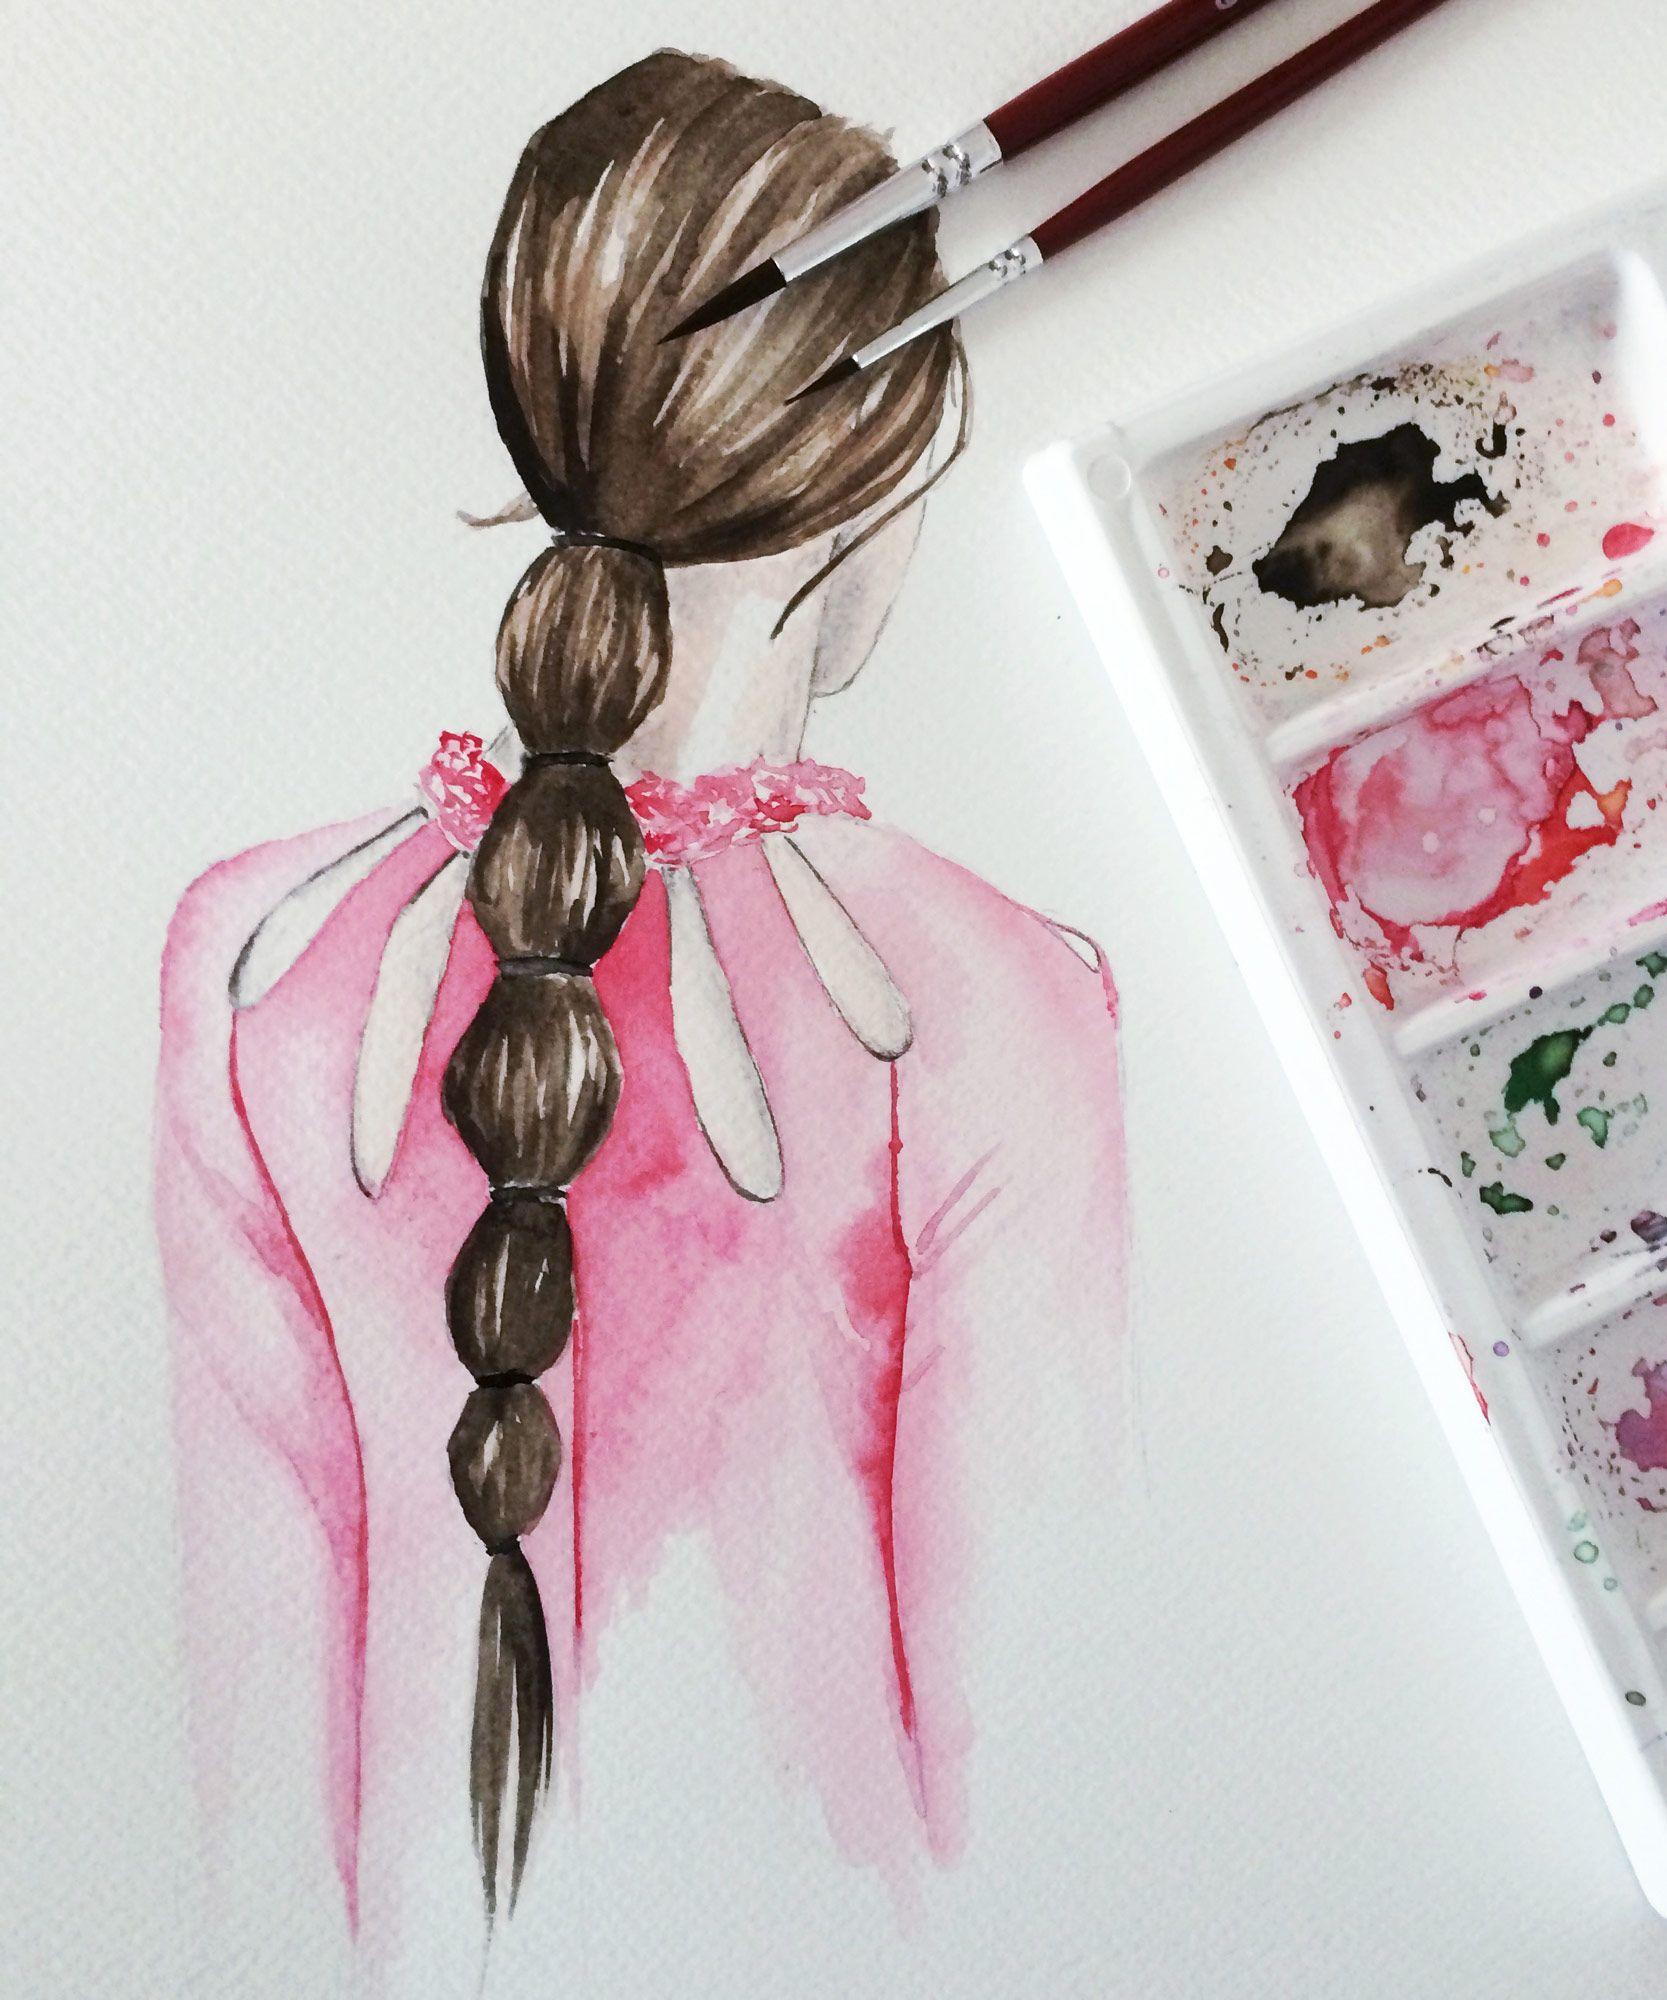 5 Fashion Illustrators To Follow On Instagram 5 Fashion Illustrators To Follow On Instagram new photo